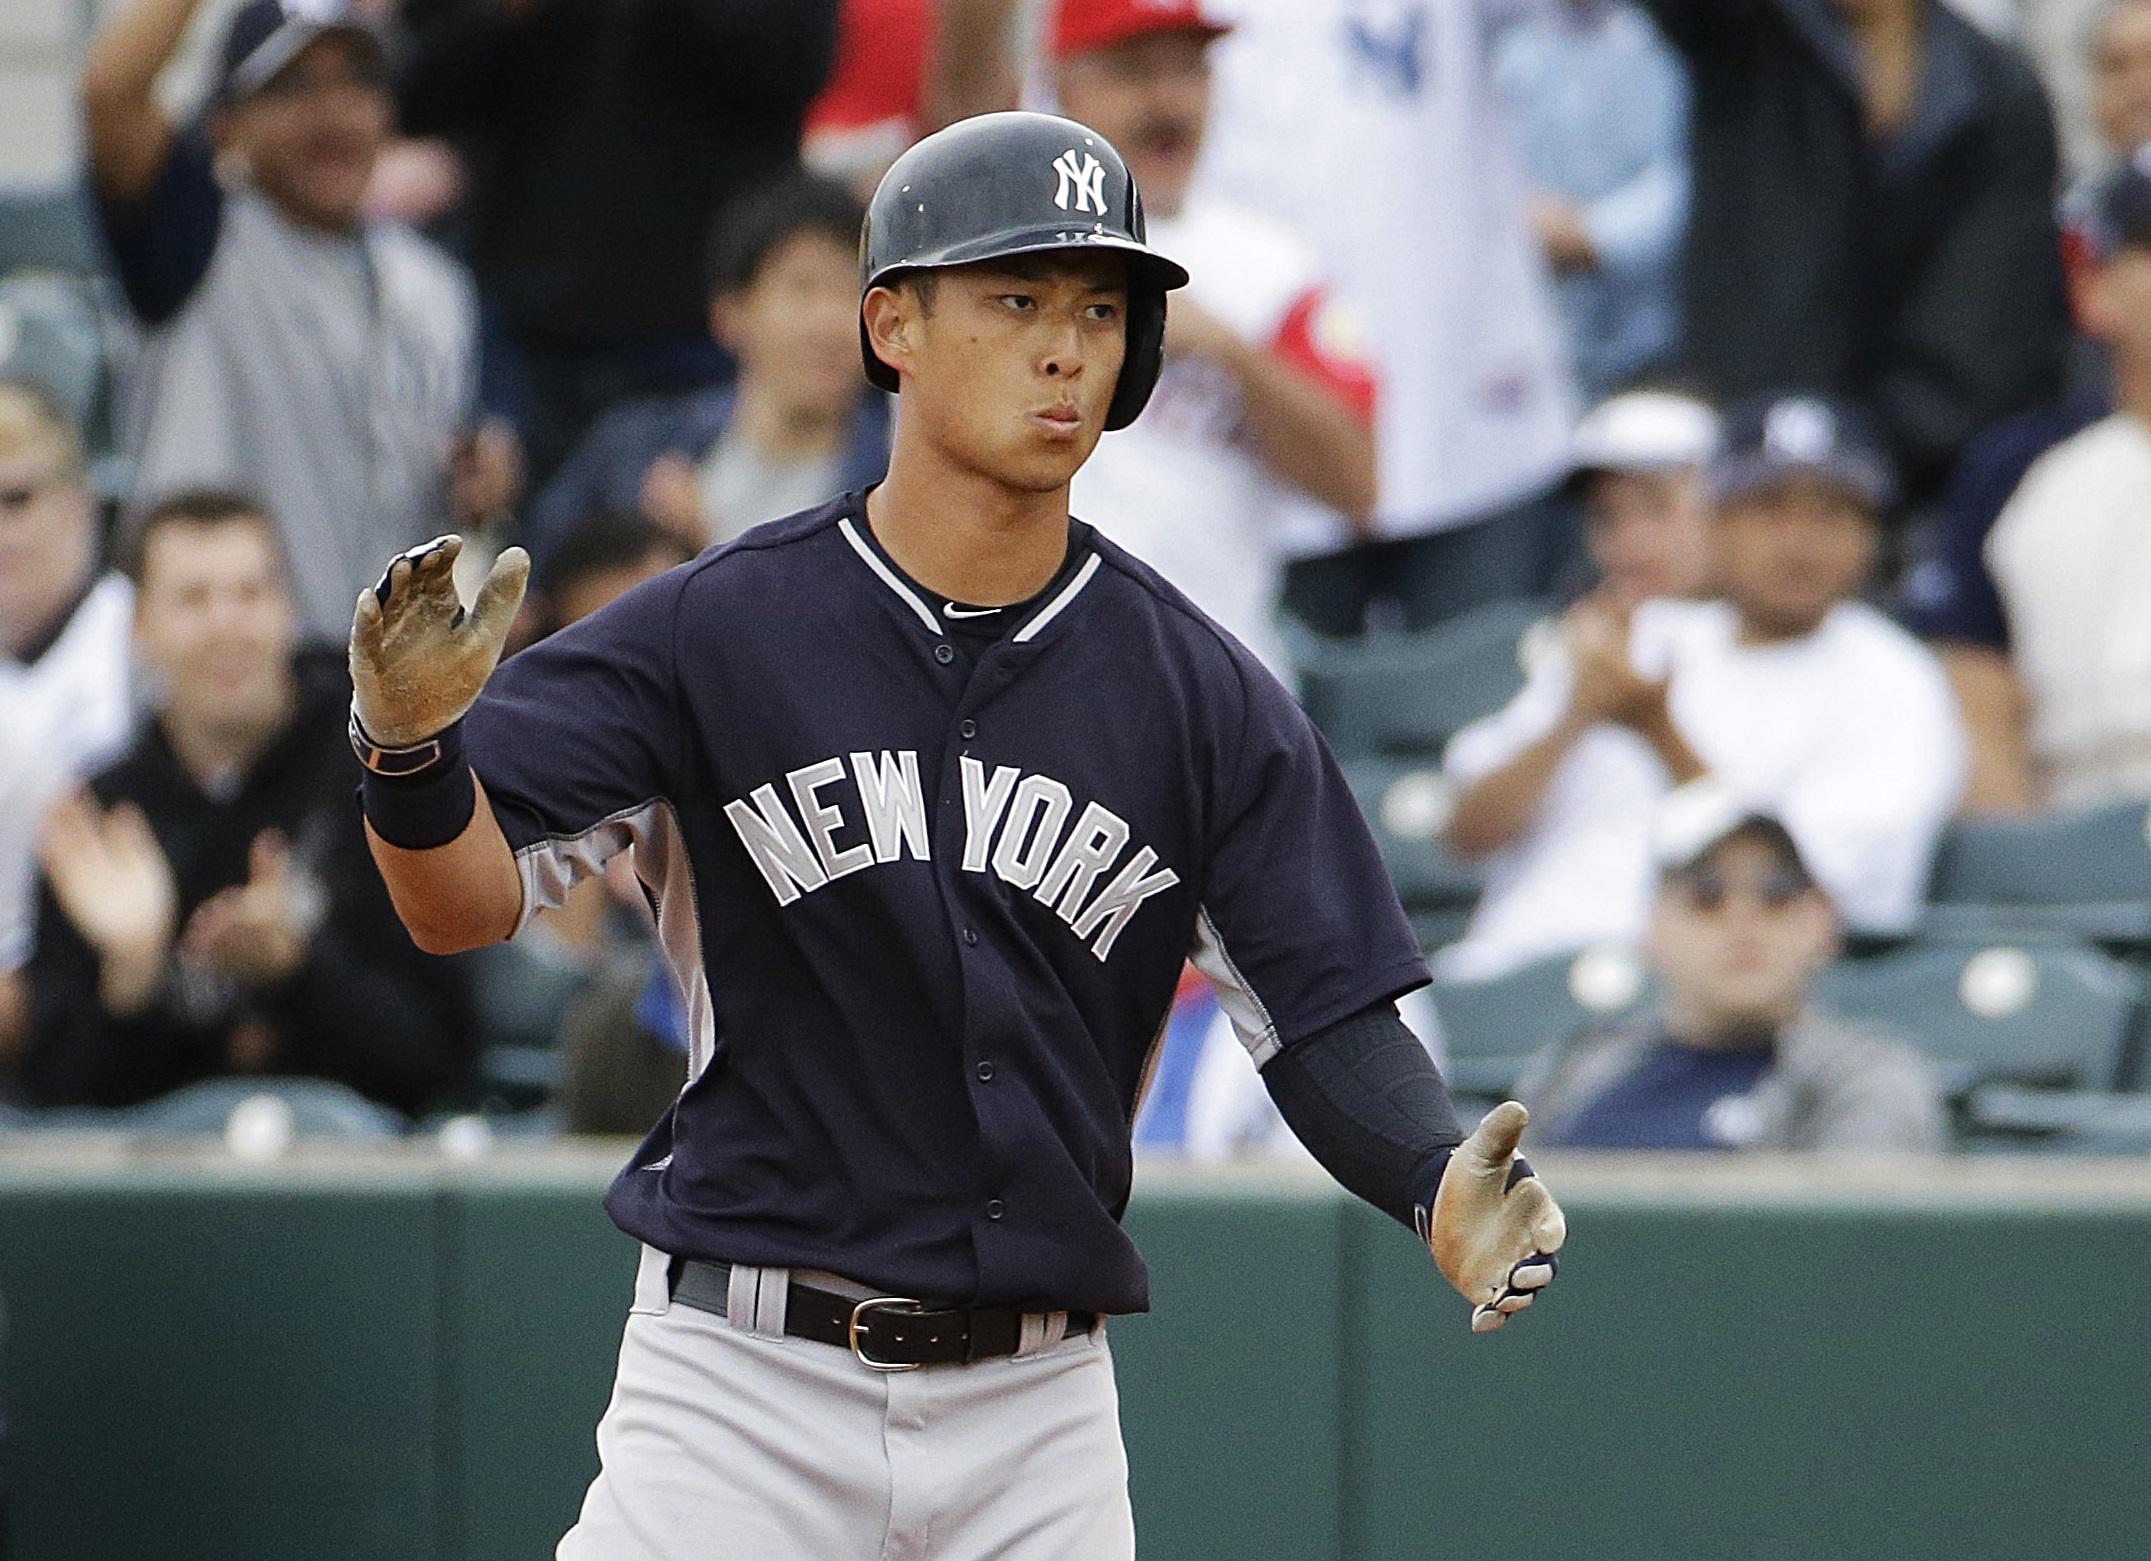 Times Up Rob 2b Korea The American Korean Refsnyder Call – Yankees 3jLA5R4